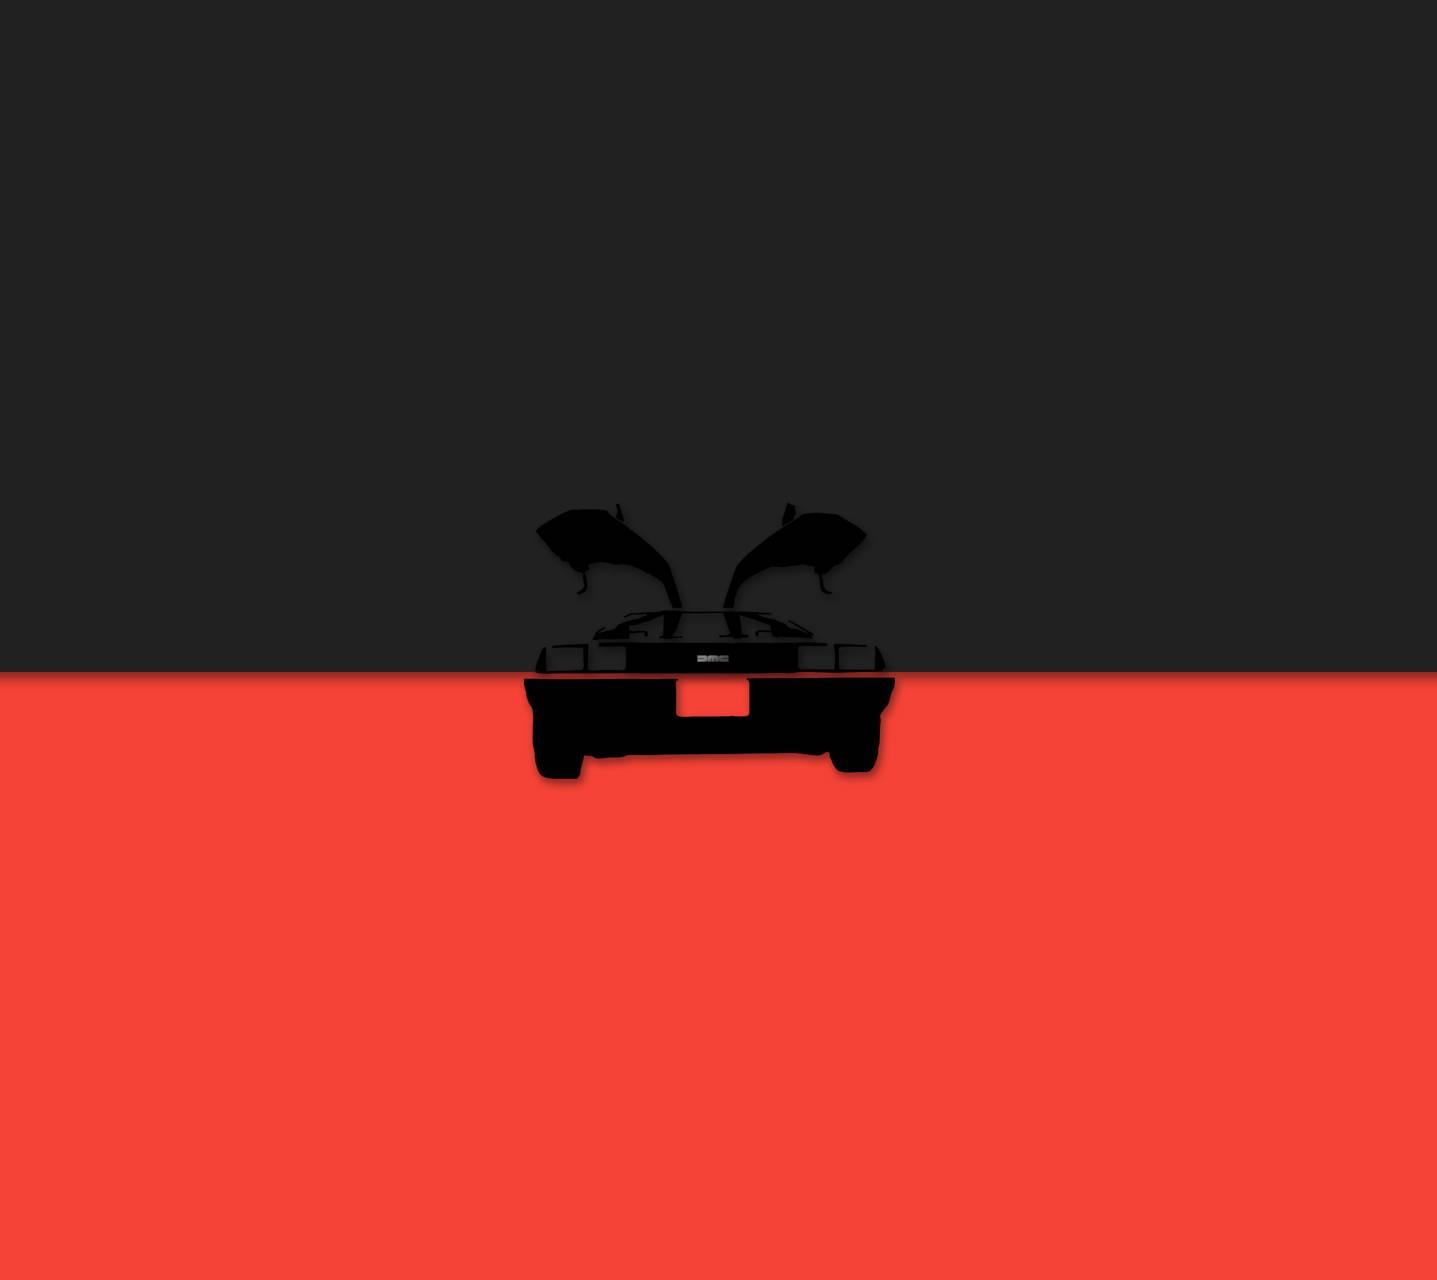 DMC Red